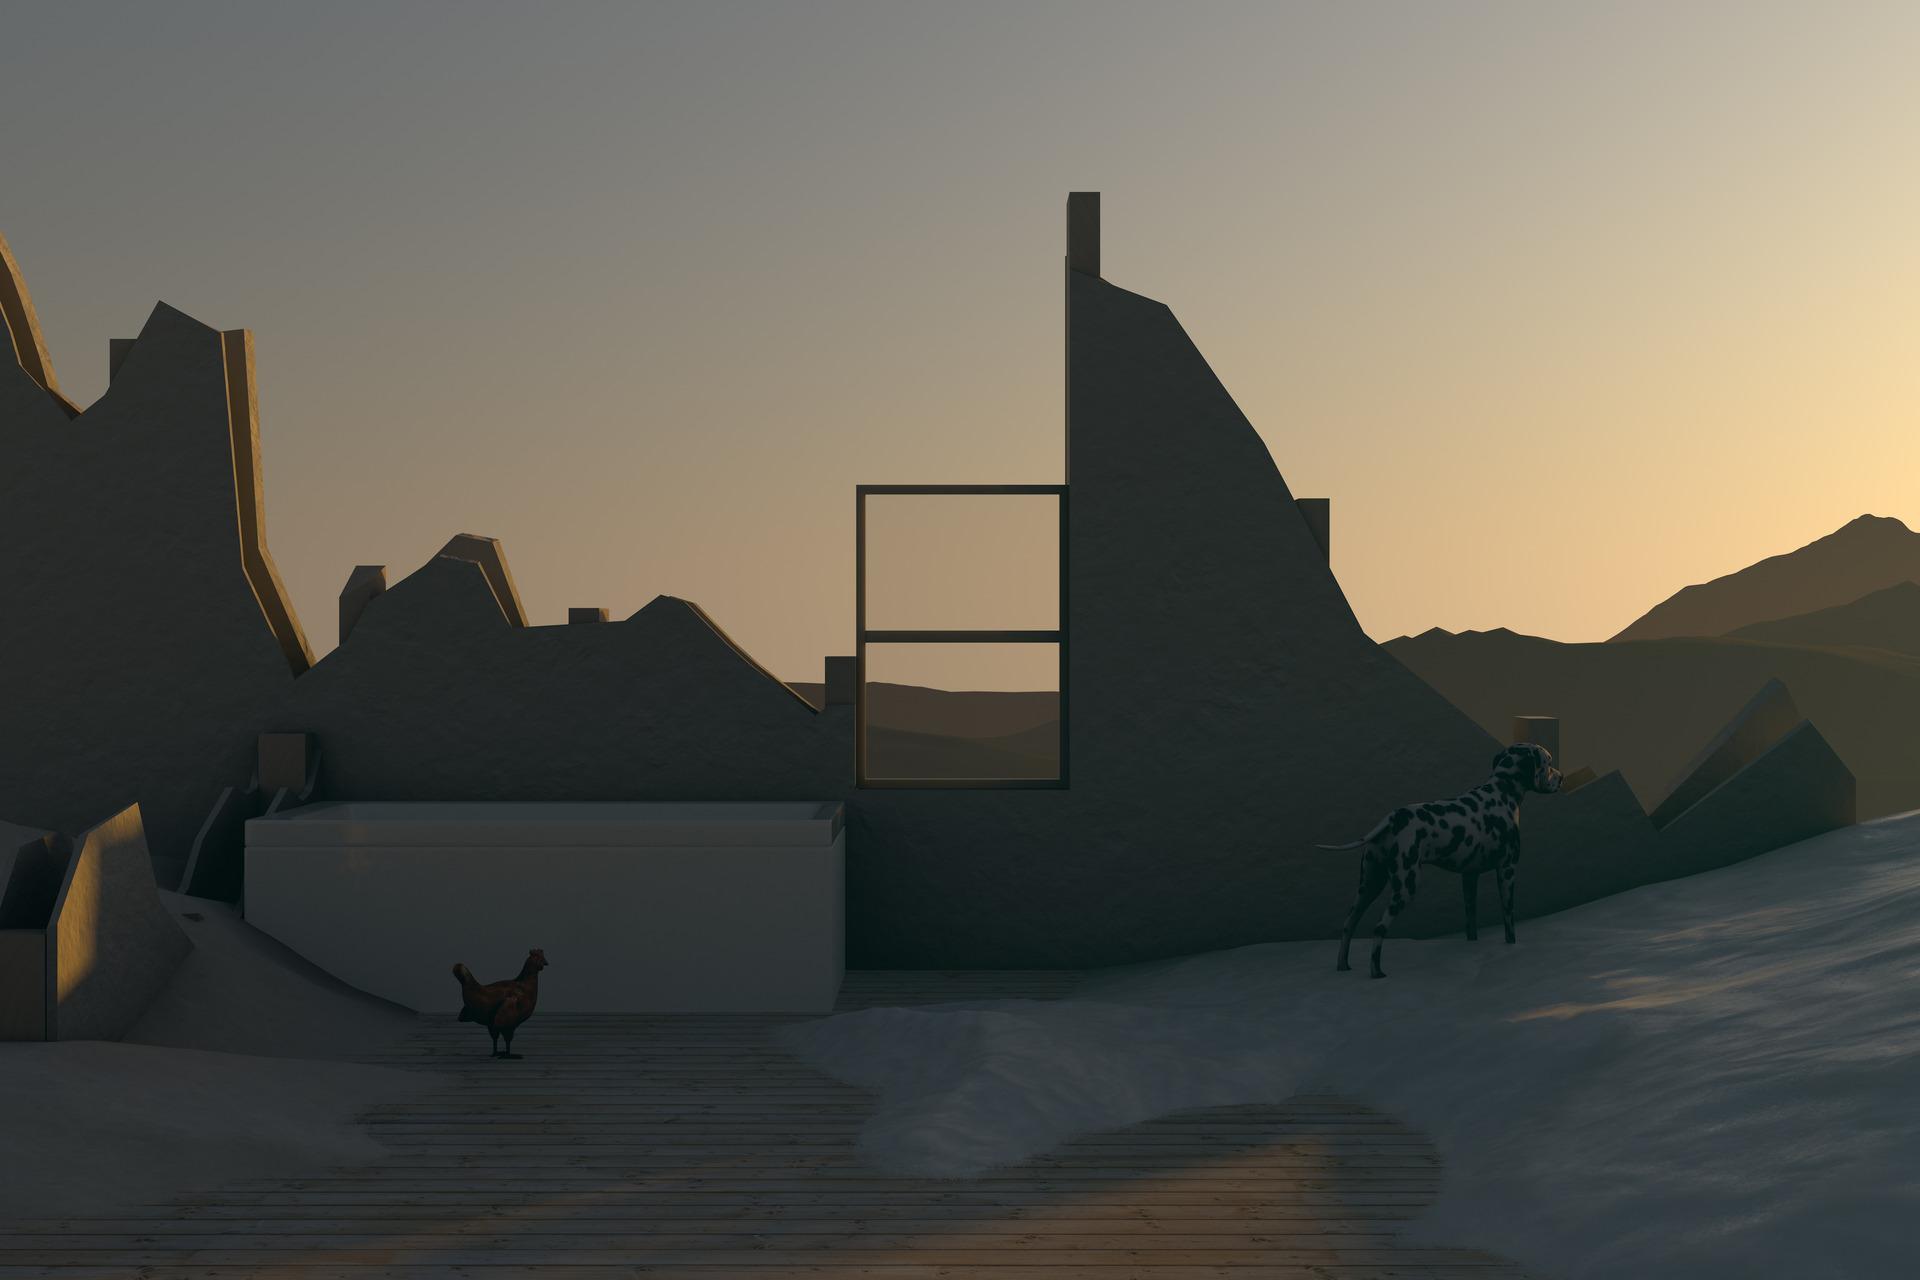 Plot: Sci-Fi Scripted Landscape